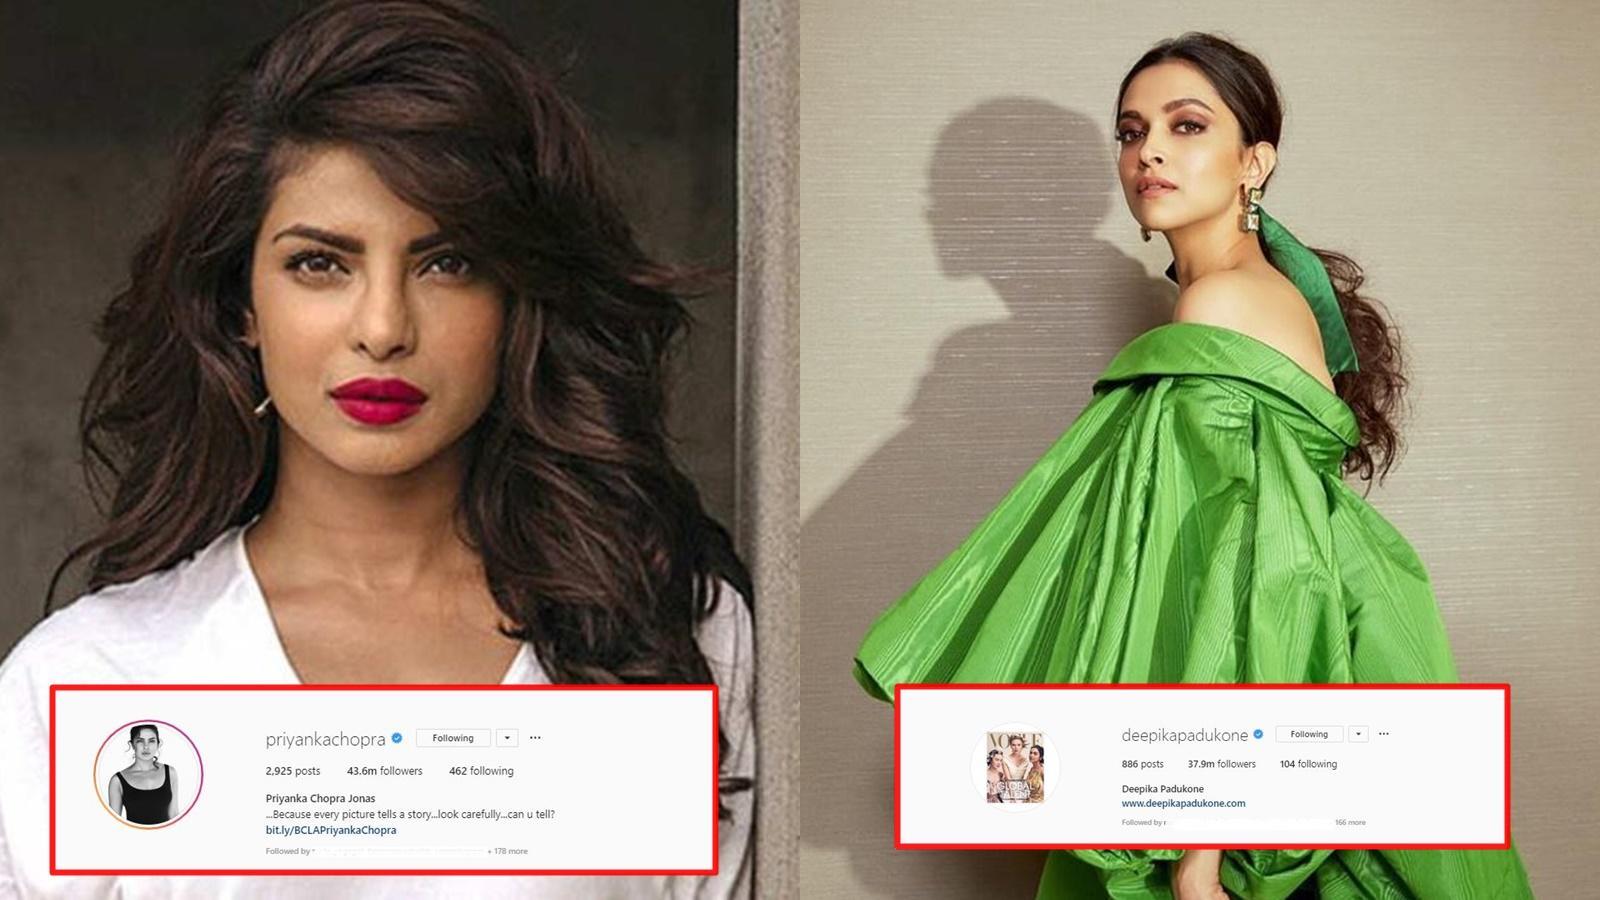 Deepika Padukone, Priyanka Chopra among top celebrities with high fake  Instagram followers